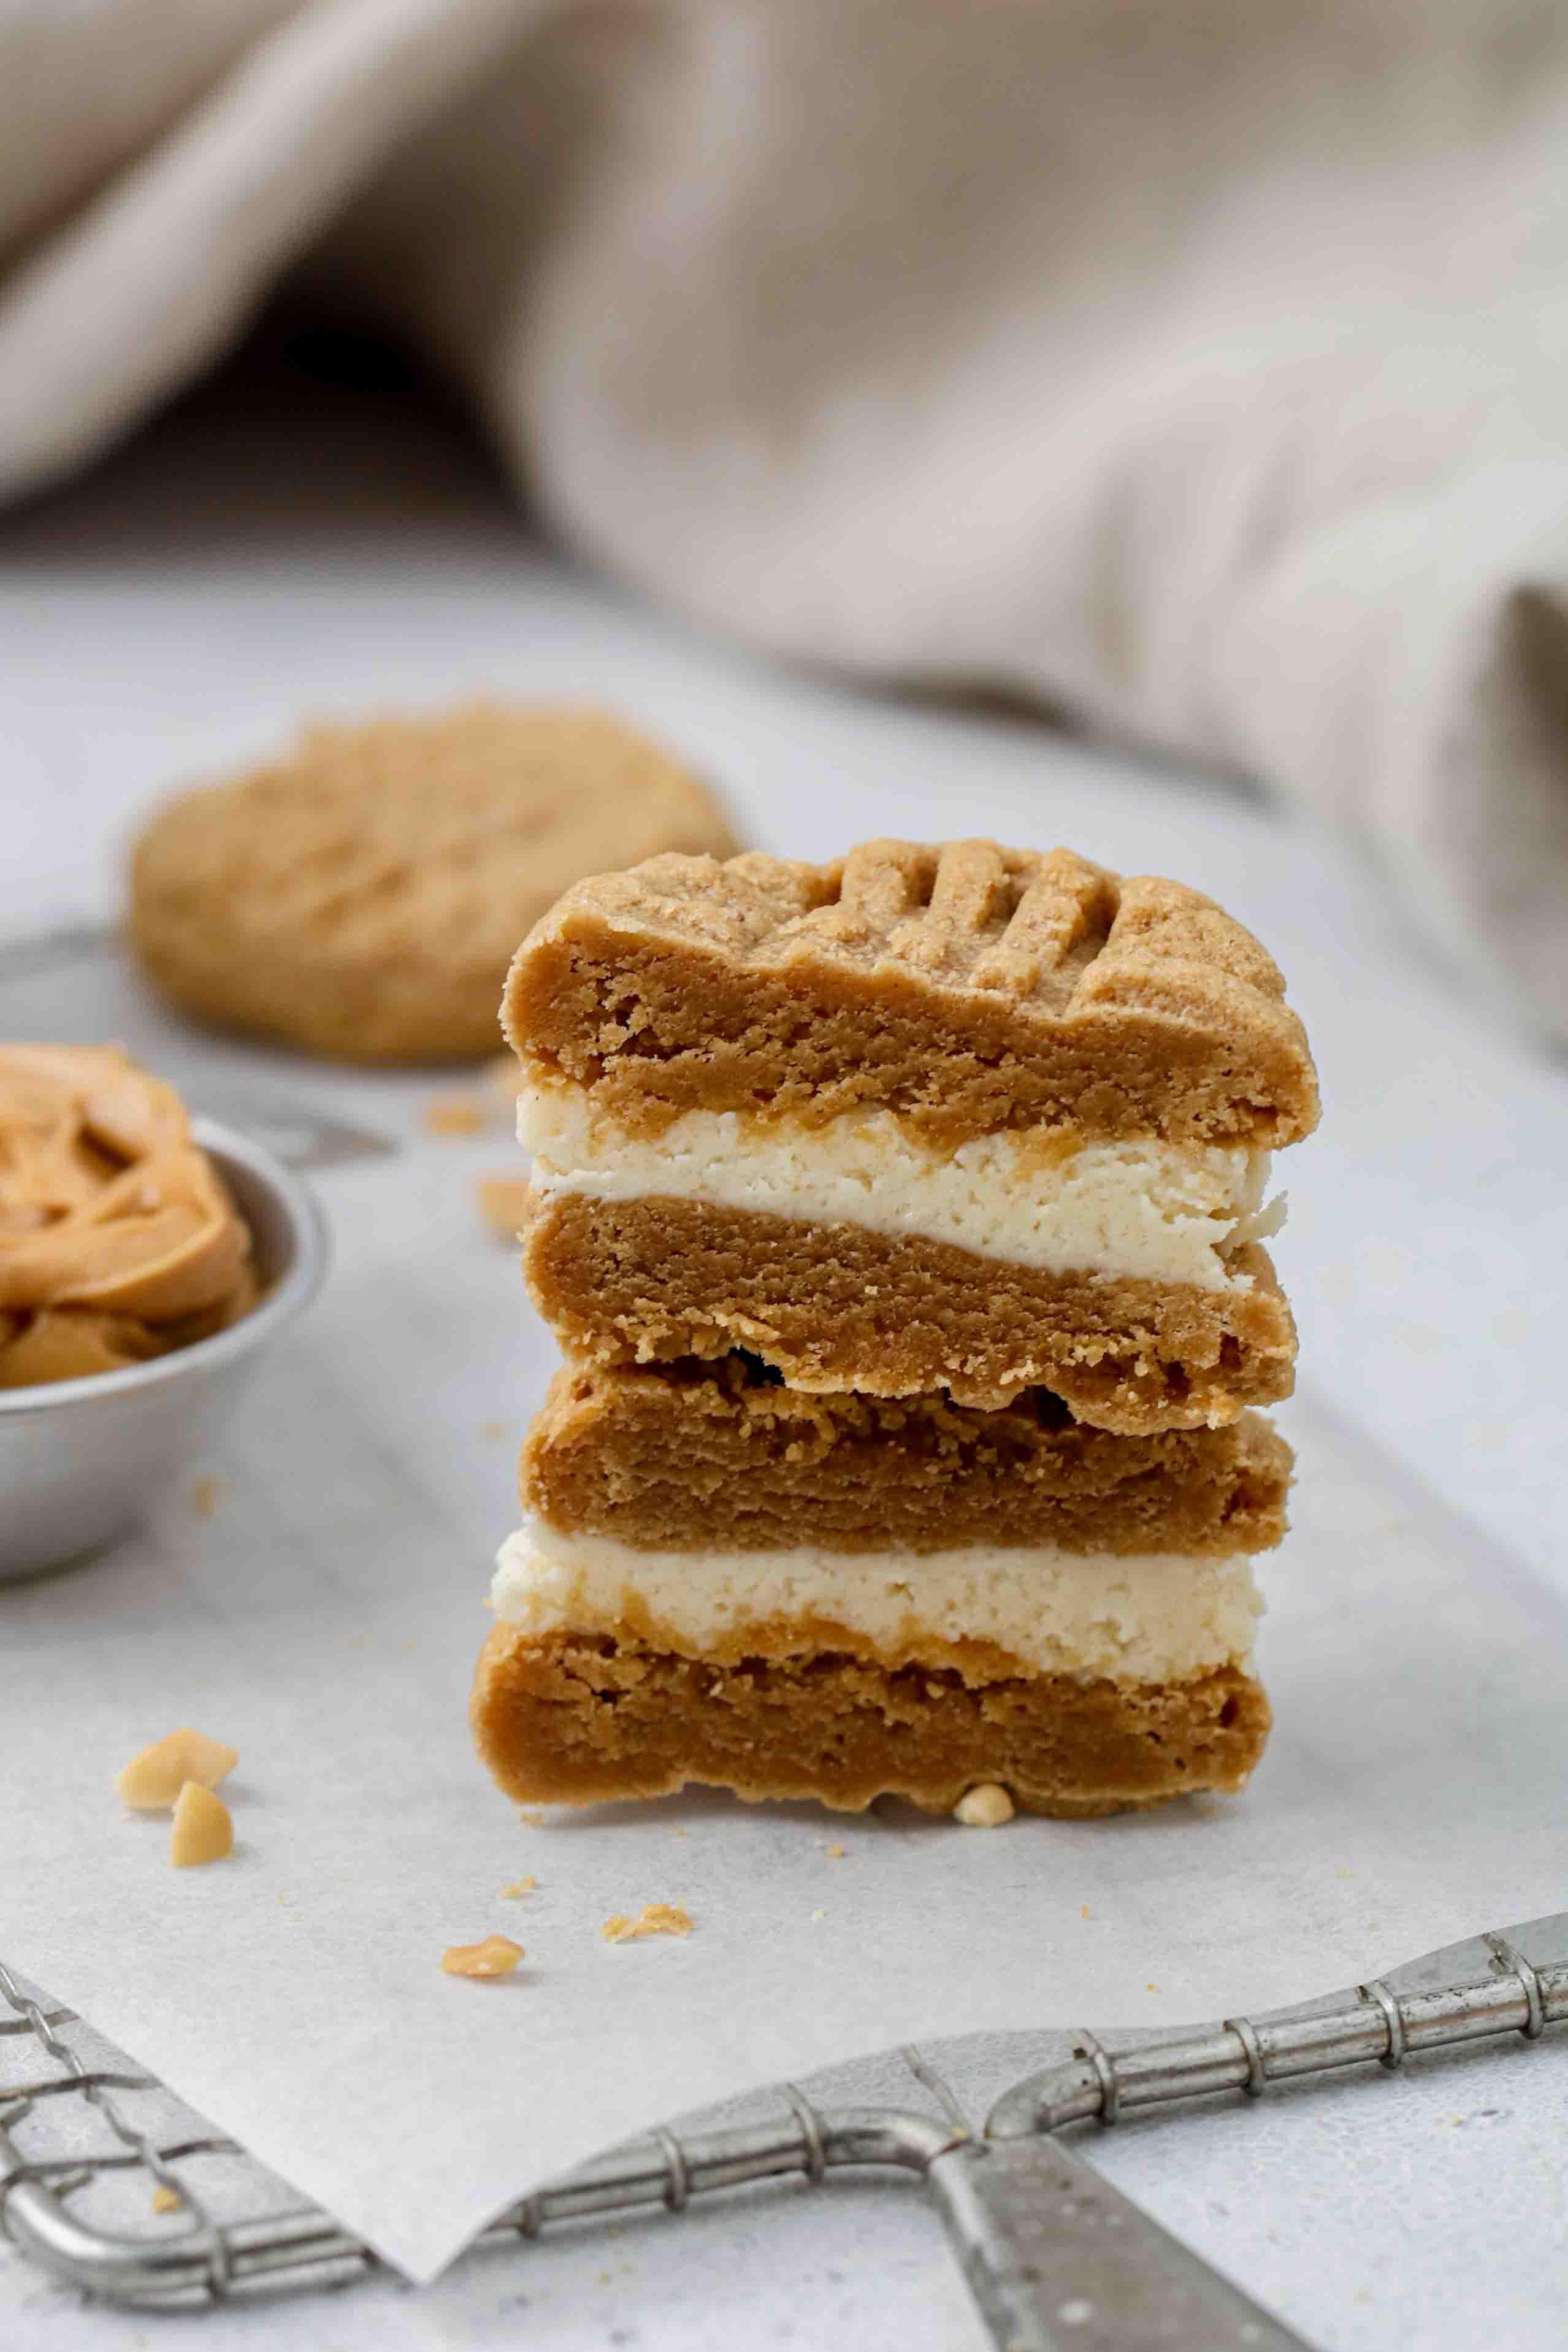 Stuffed peanut butter cookies